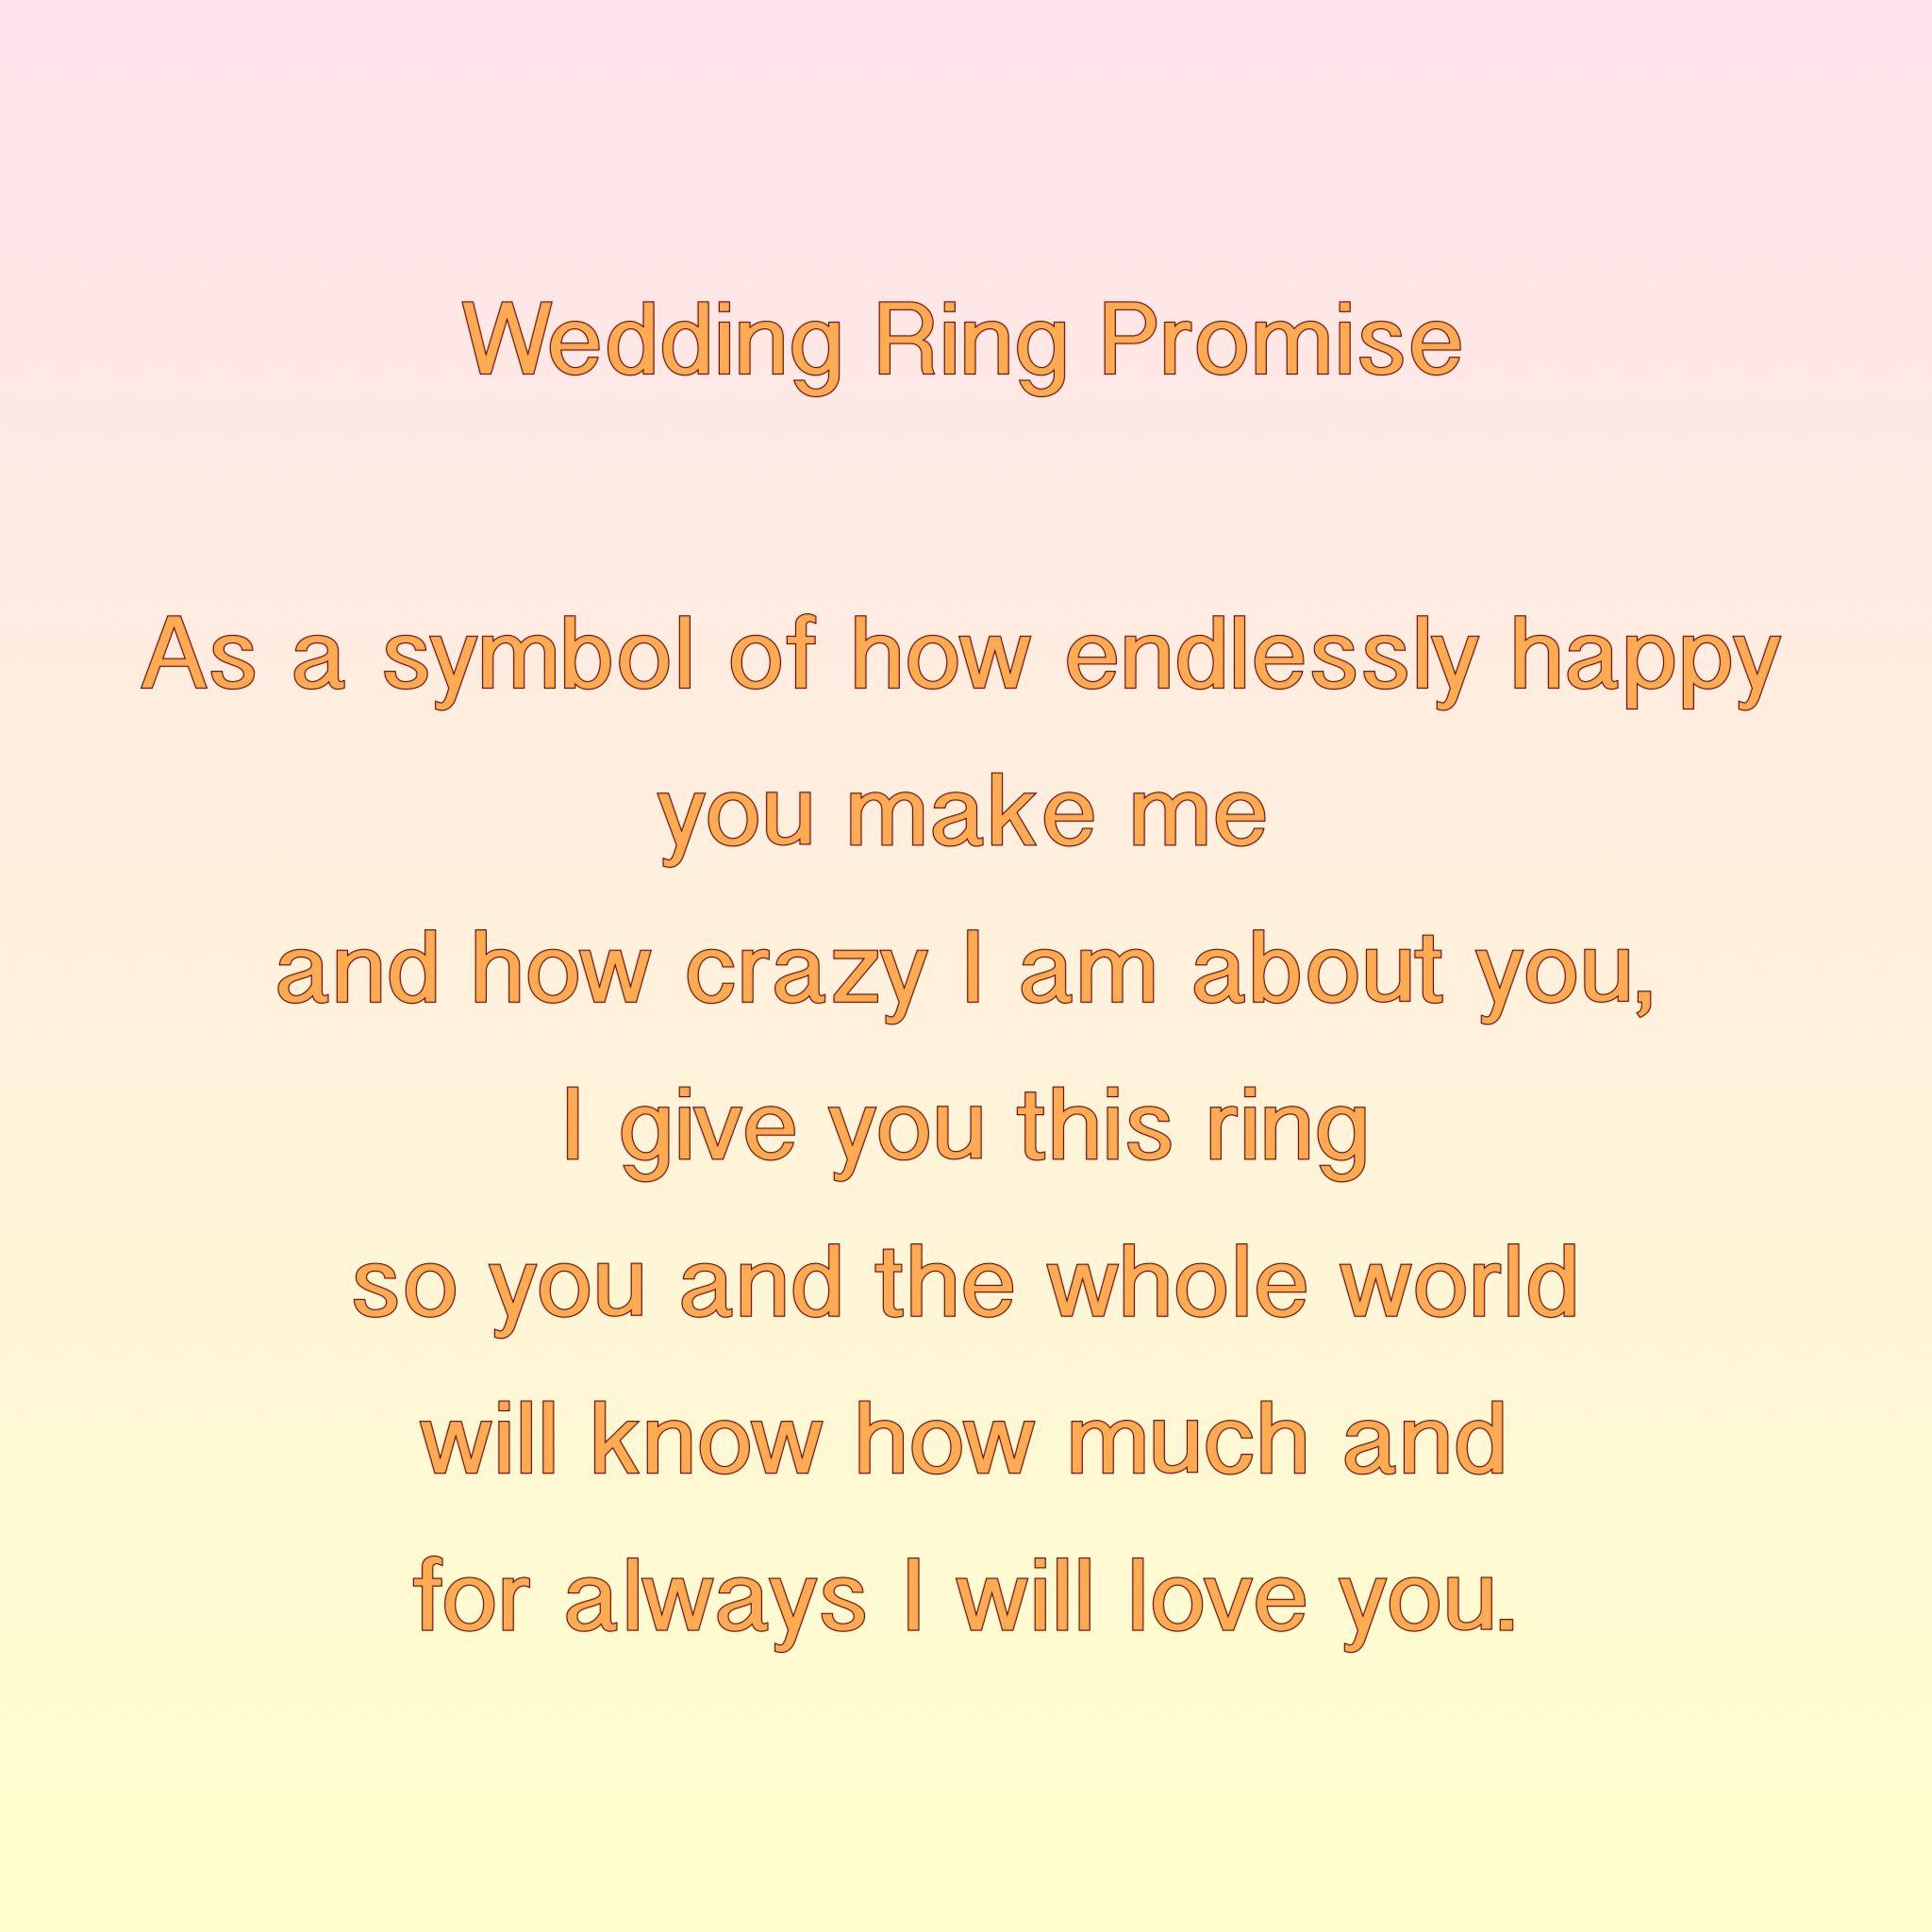 Wedding Ring Exchange Wedding ceremony rings, Ring